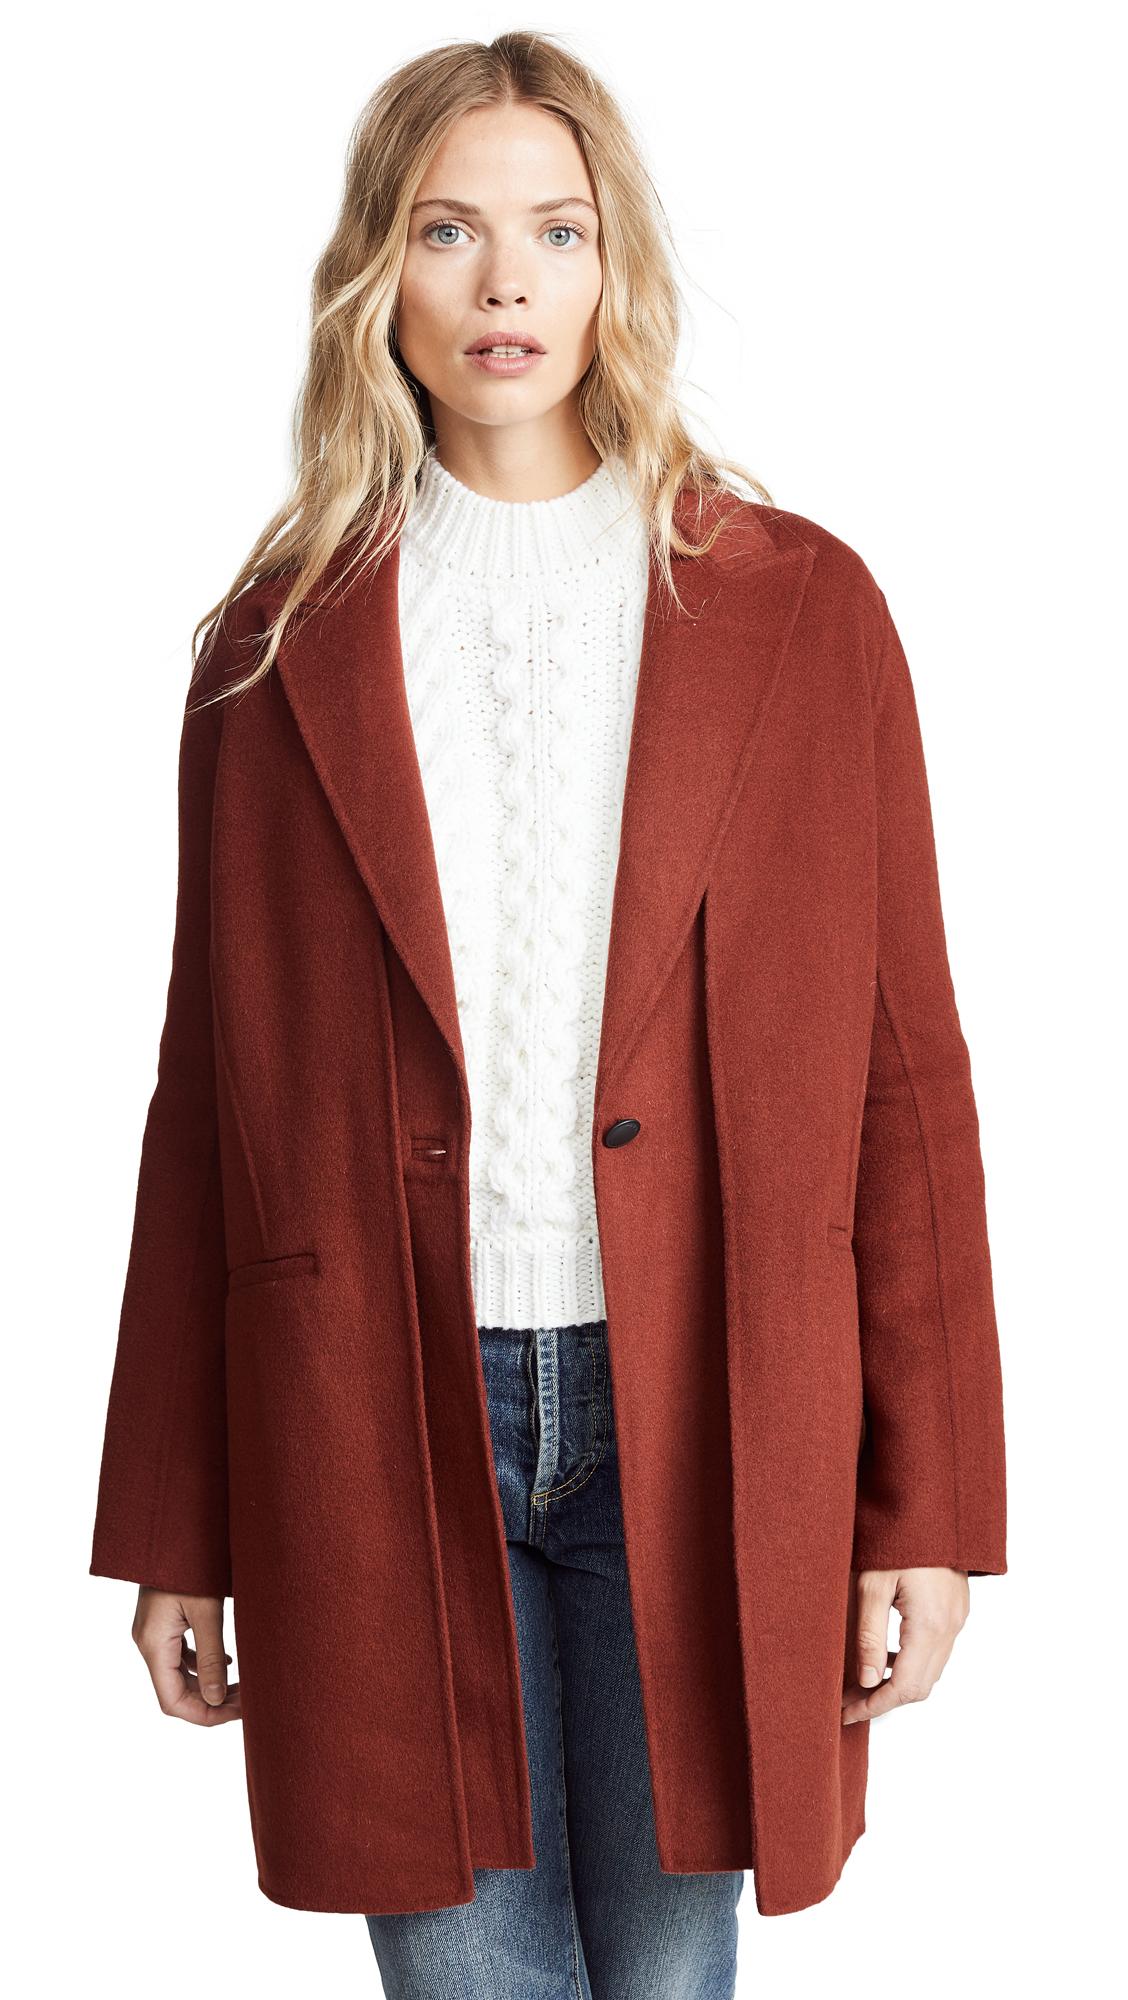 Rag & Bone Kaye Coat with Removable Vest